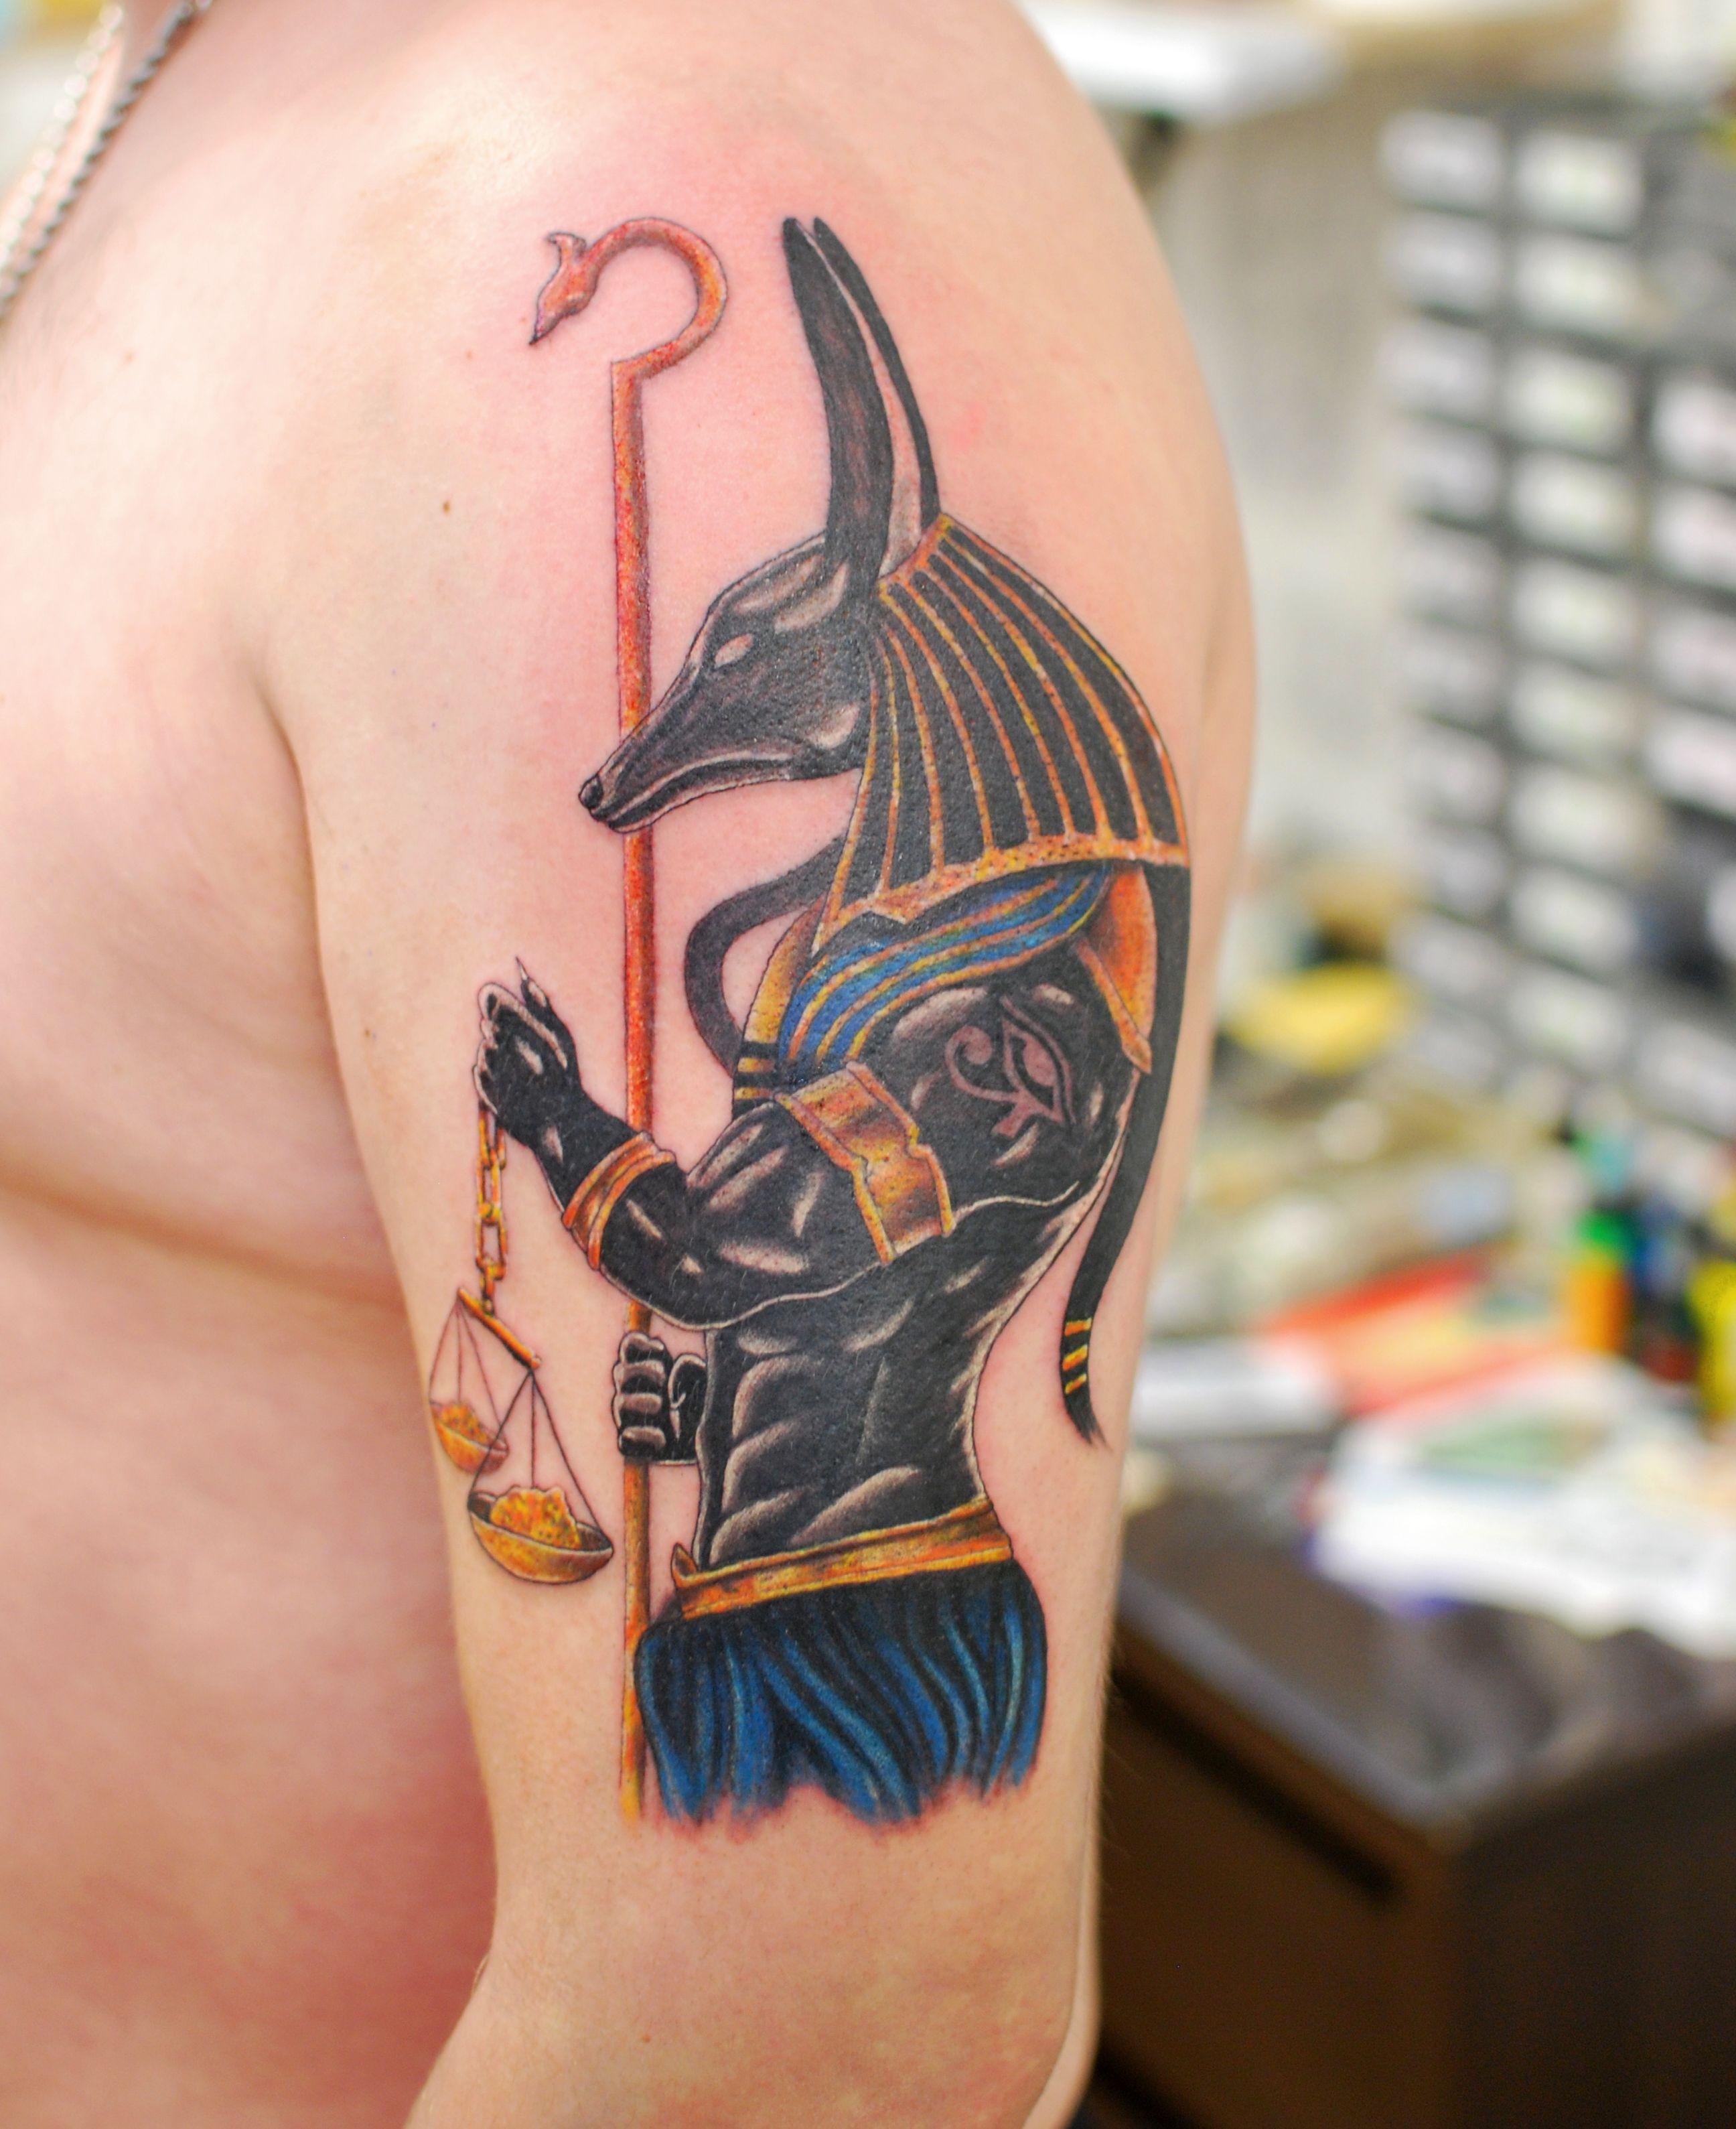 Tattoo Frequency | tattoos design | Pinterest | Egyptian symbols ... - Tattoo Studio Bielefeld